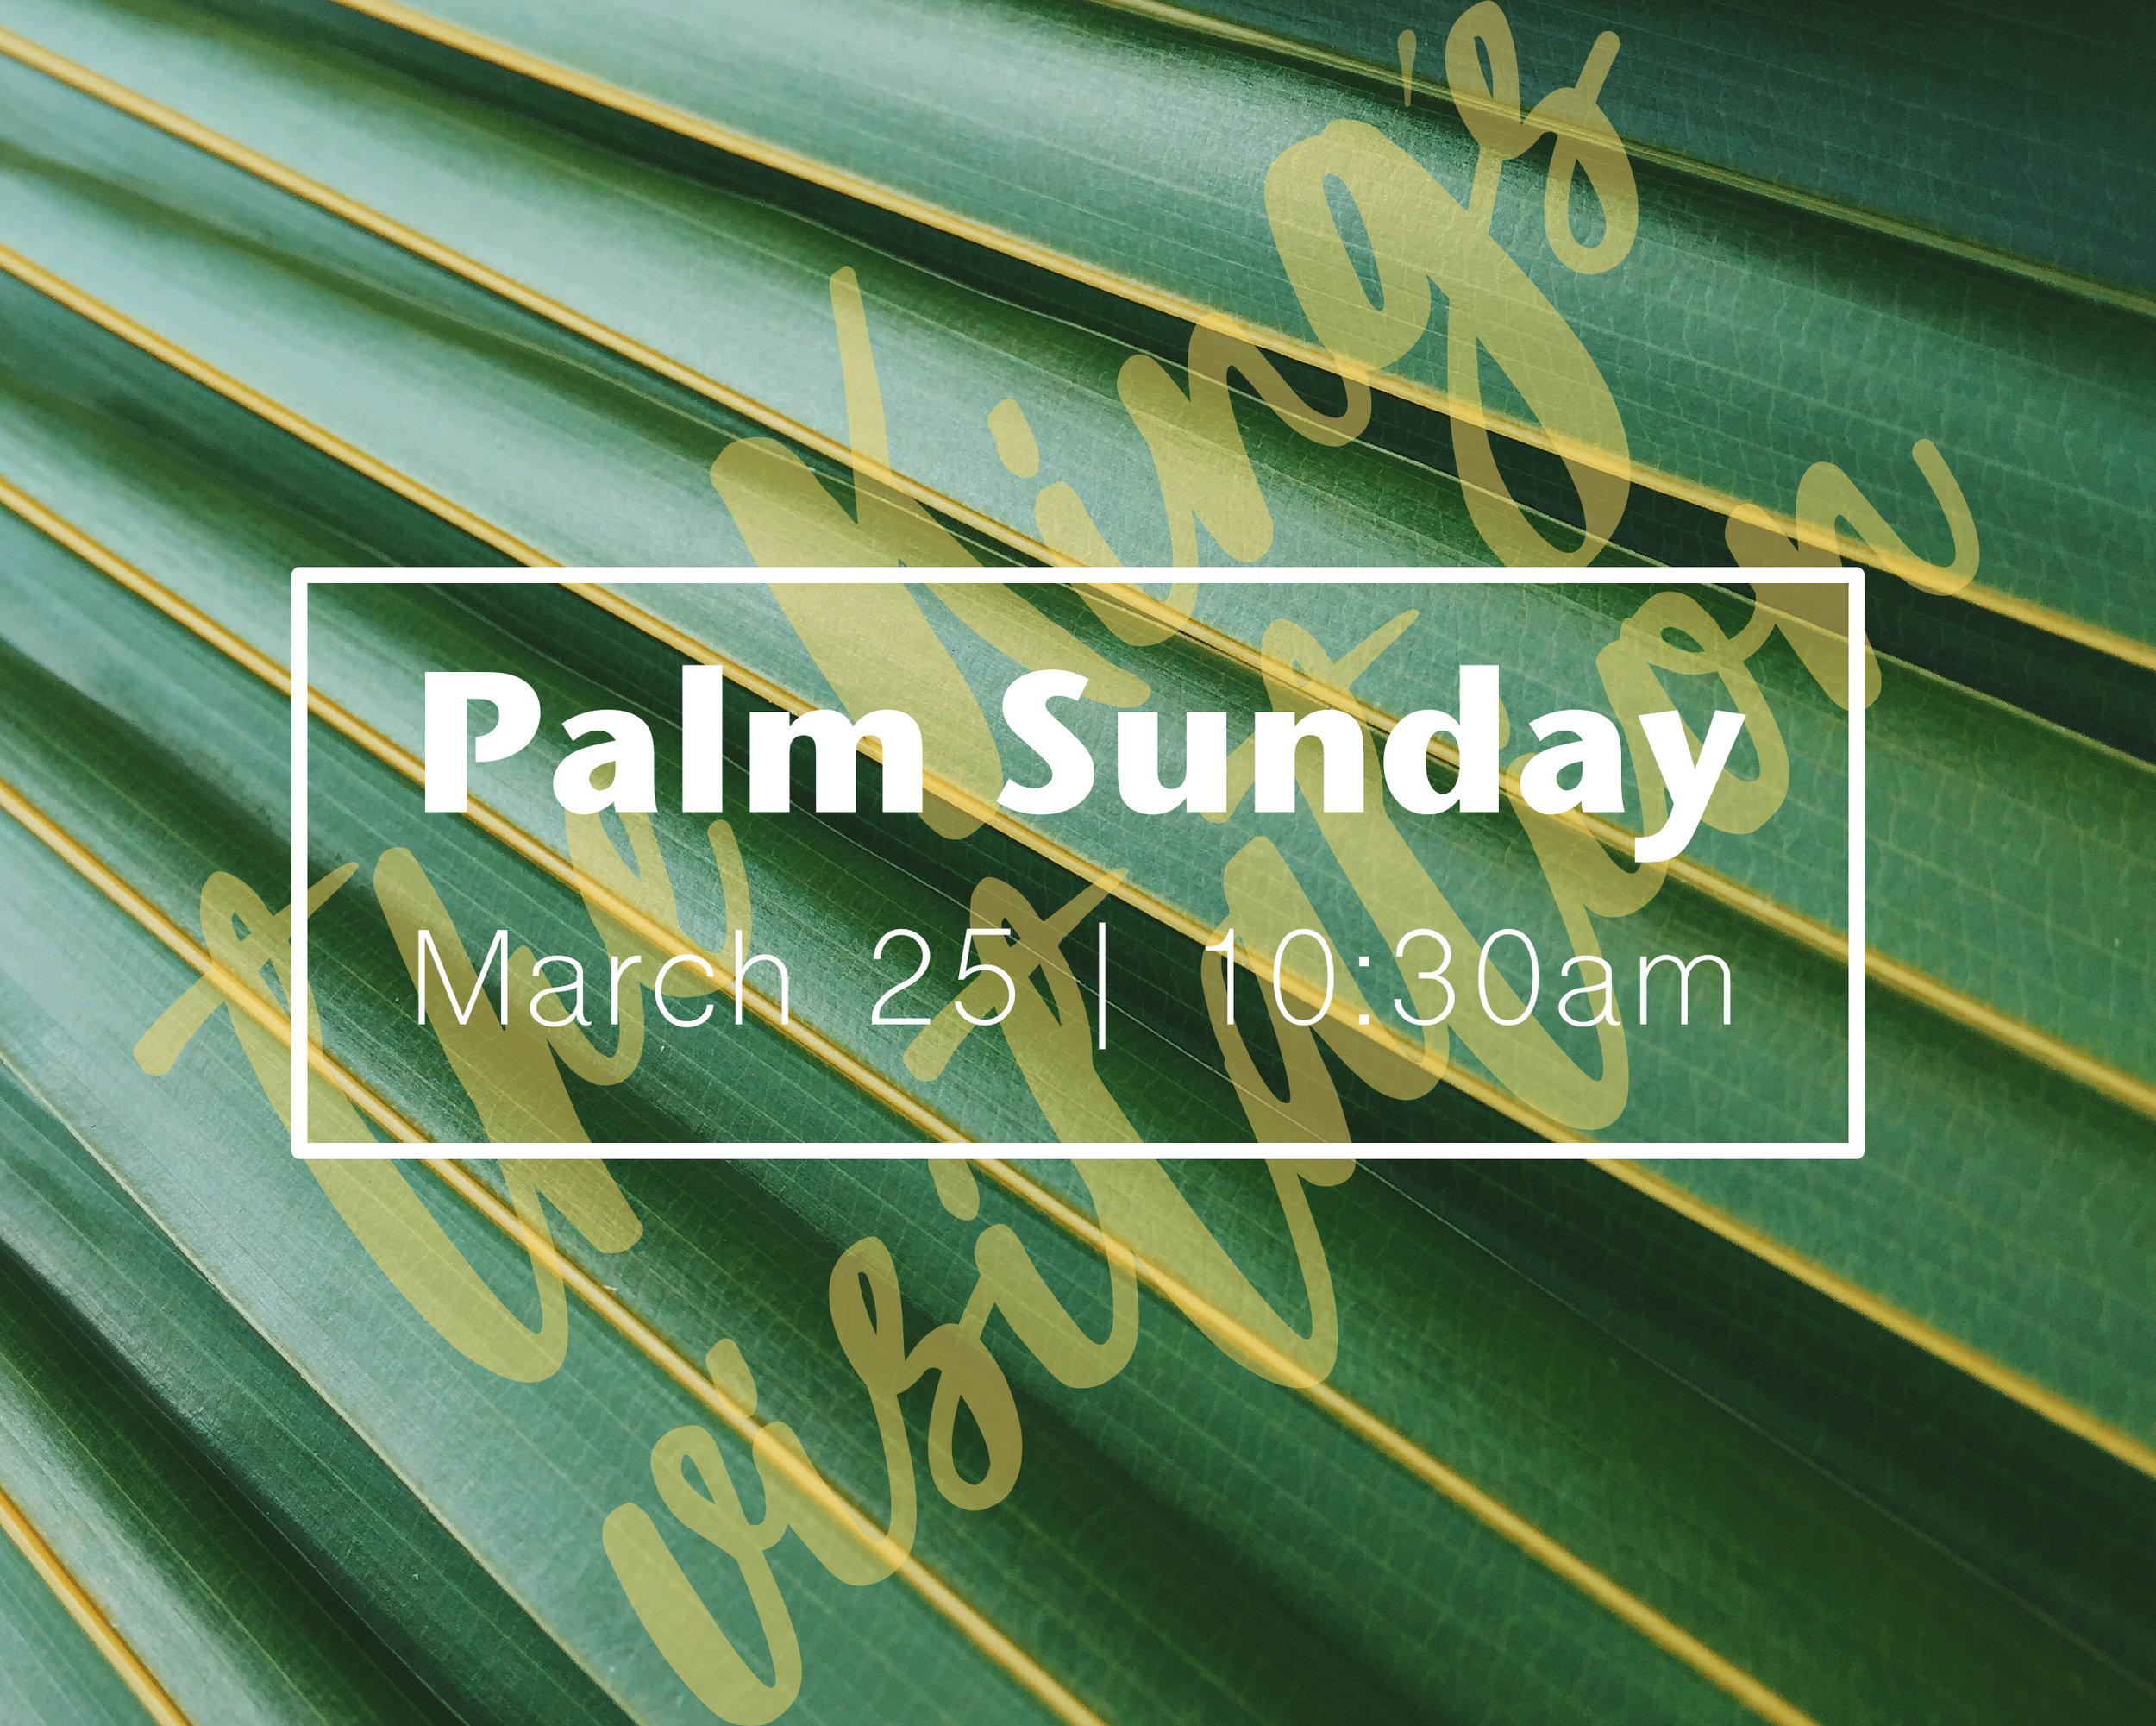 palm suday.jpg